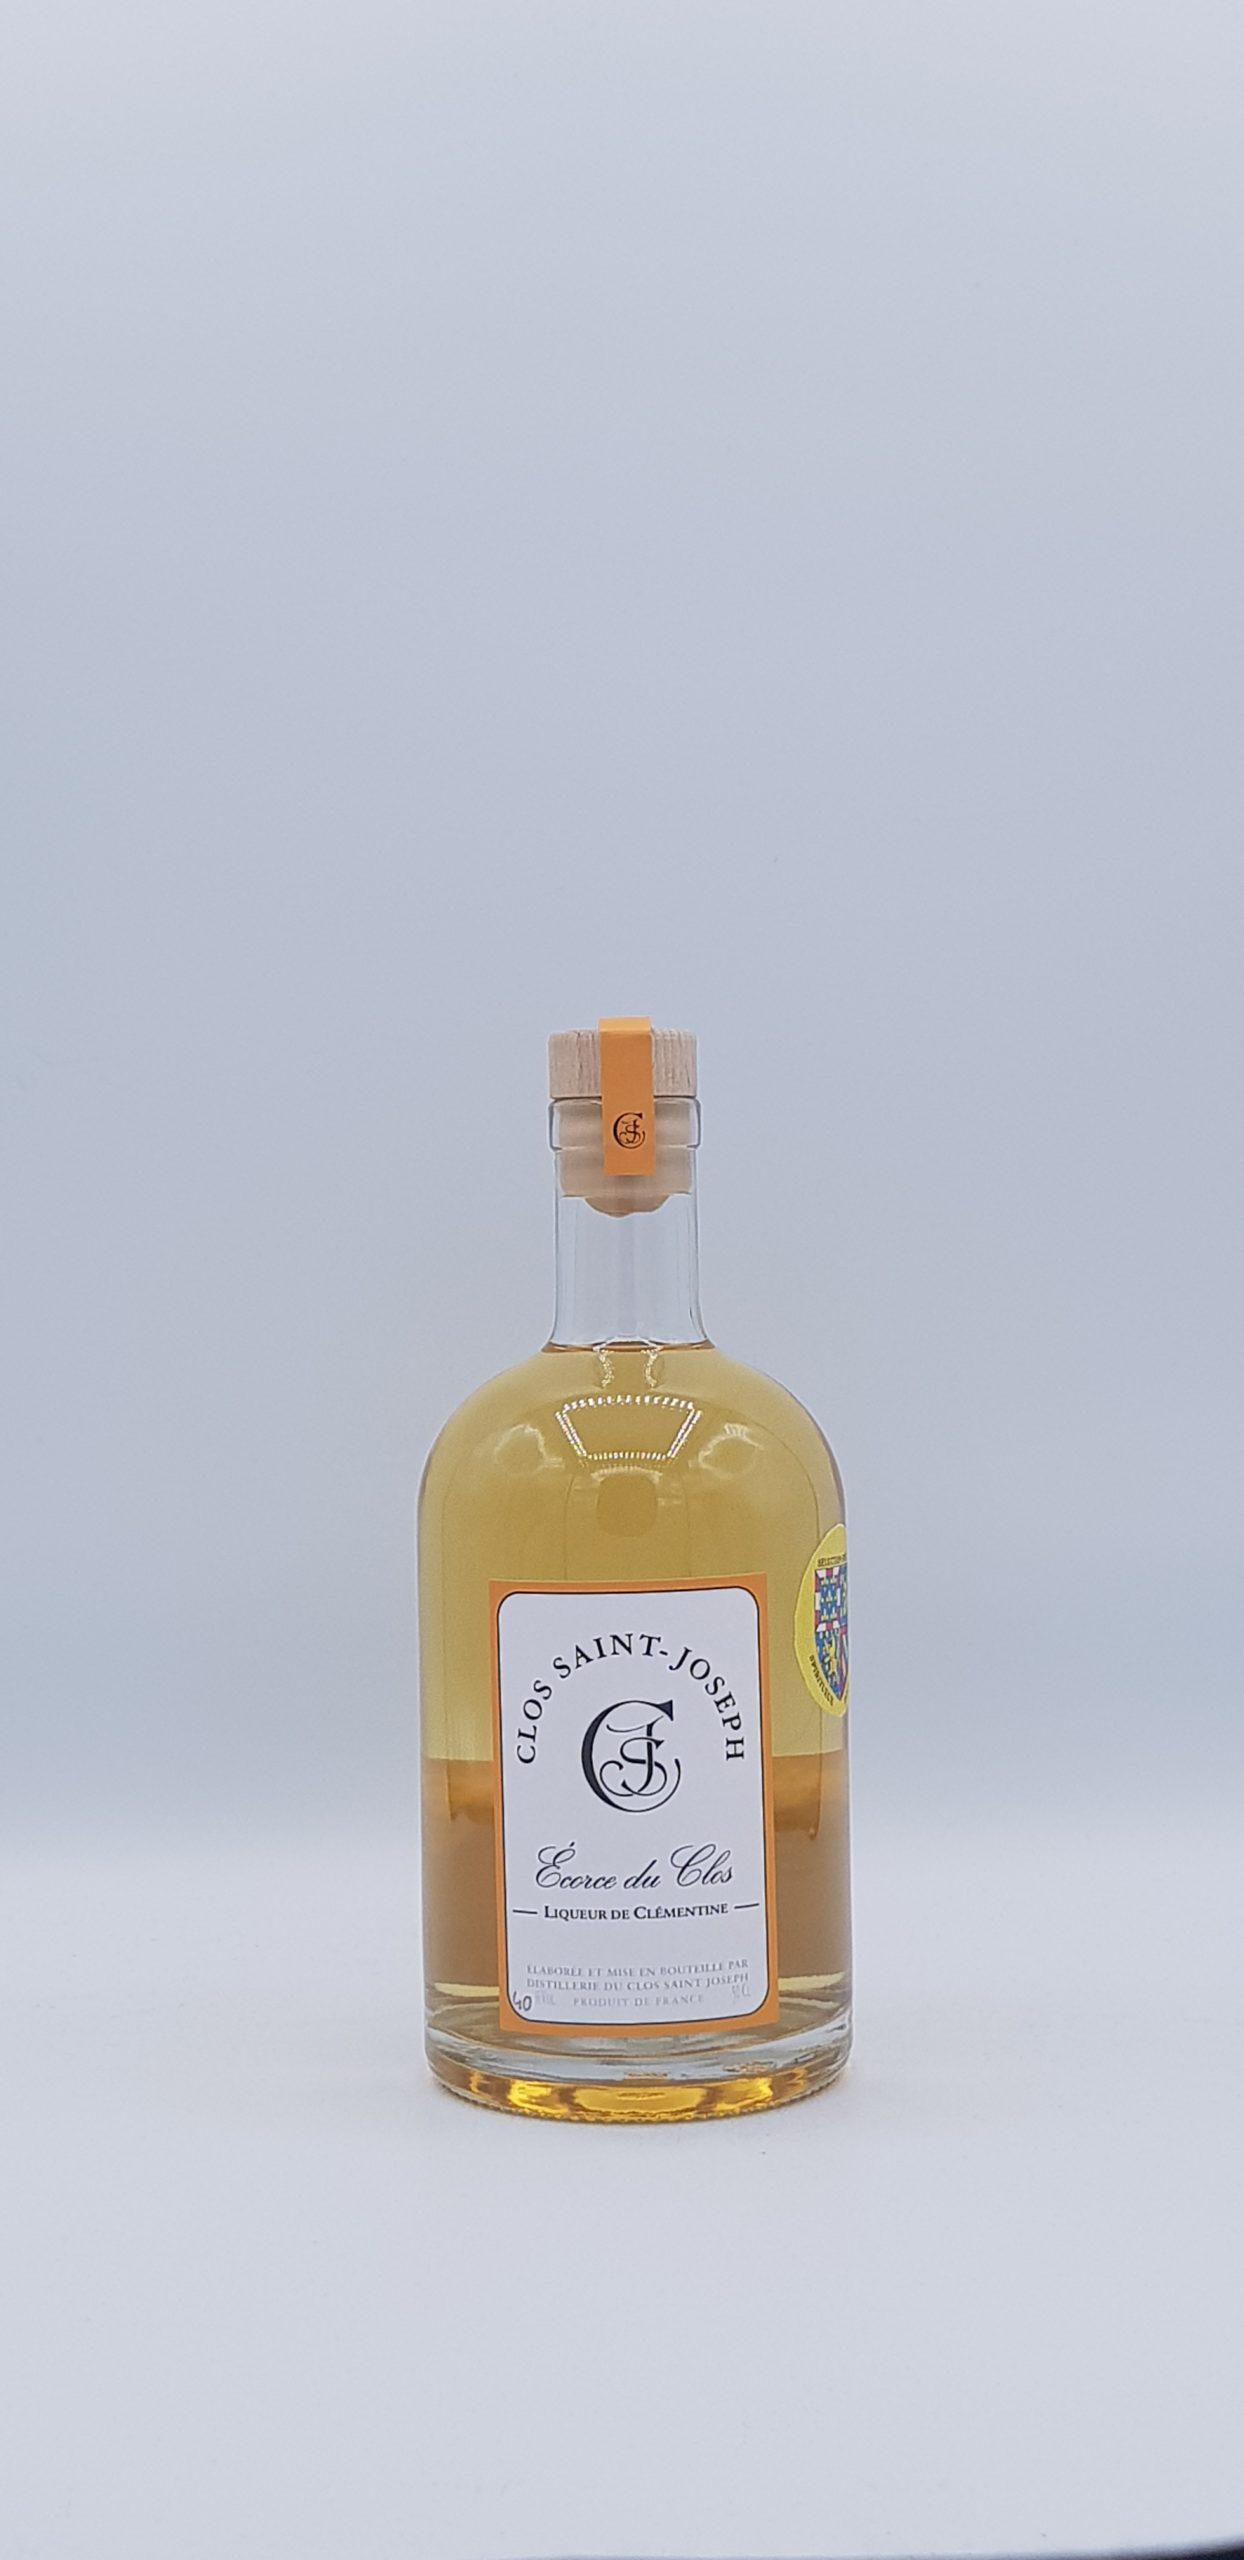 Ecorce du Clos Liqueur de Clémentine